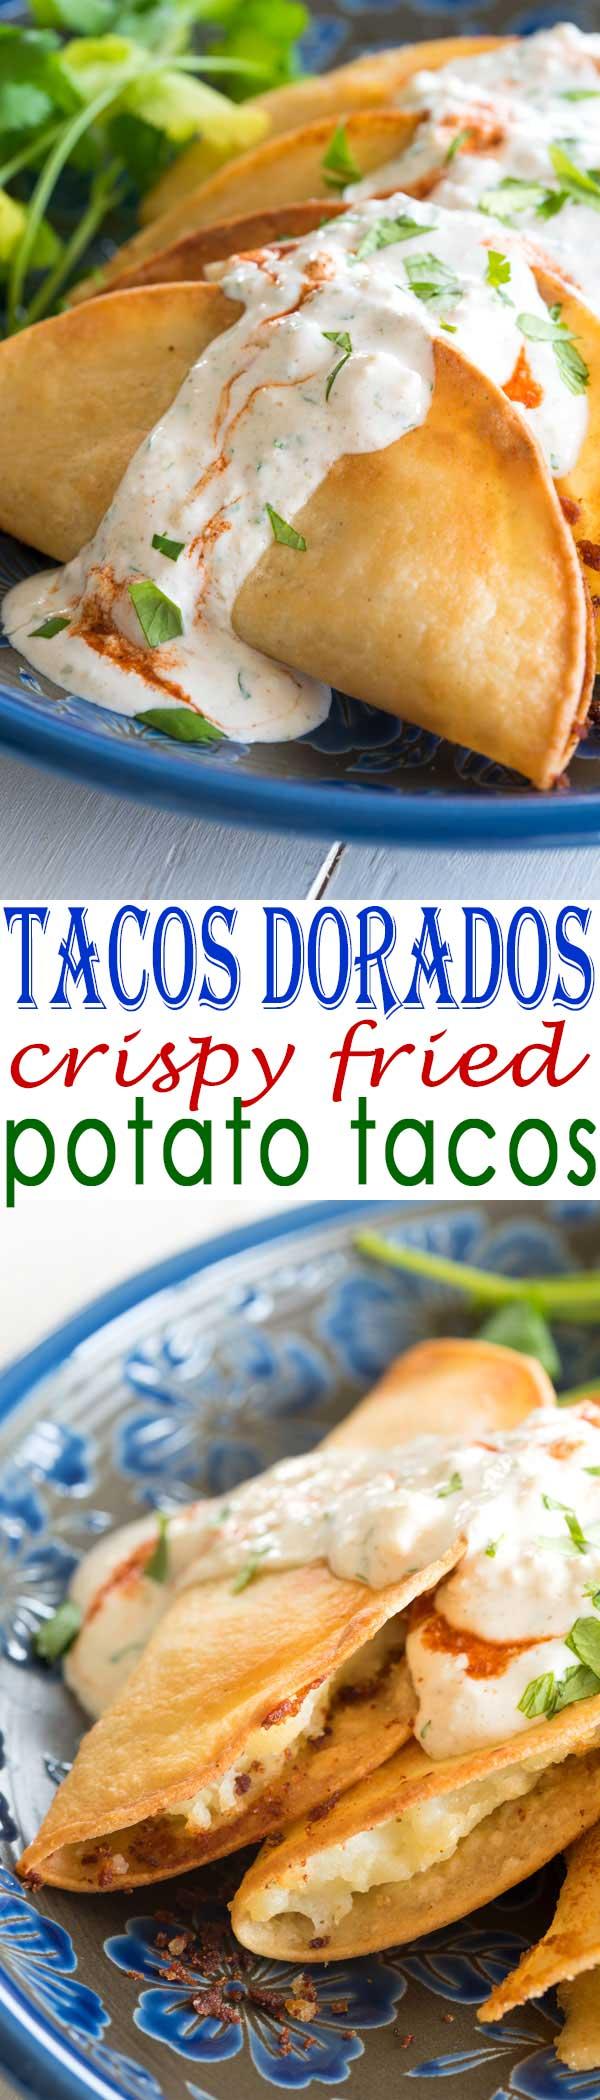 Tacos Dorados de Papa recipe - these fried potato tacos were sooo crispy!! and easy with mashed potatoes! Good for my vegan vegetarian friends too! #mexicanfoodrecipe #tacos